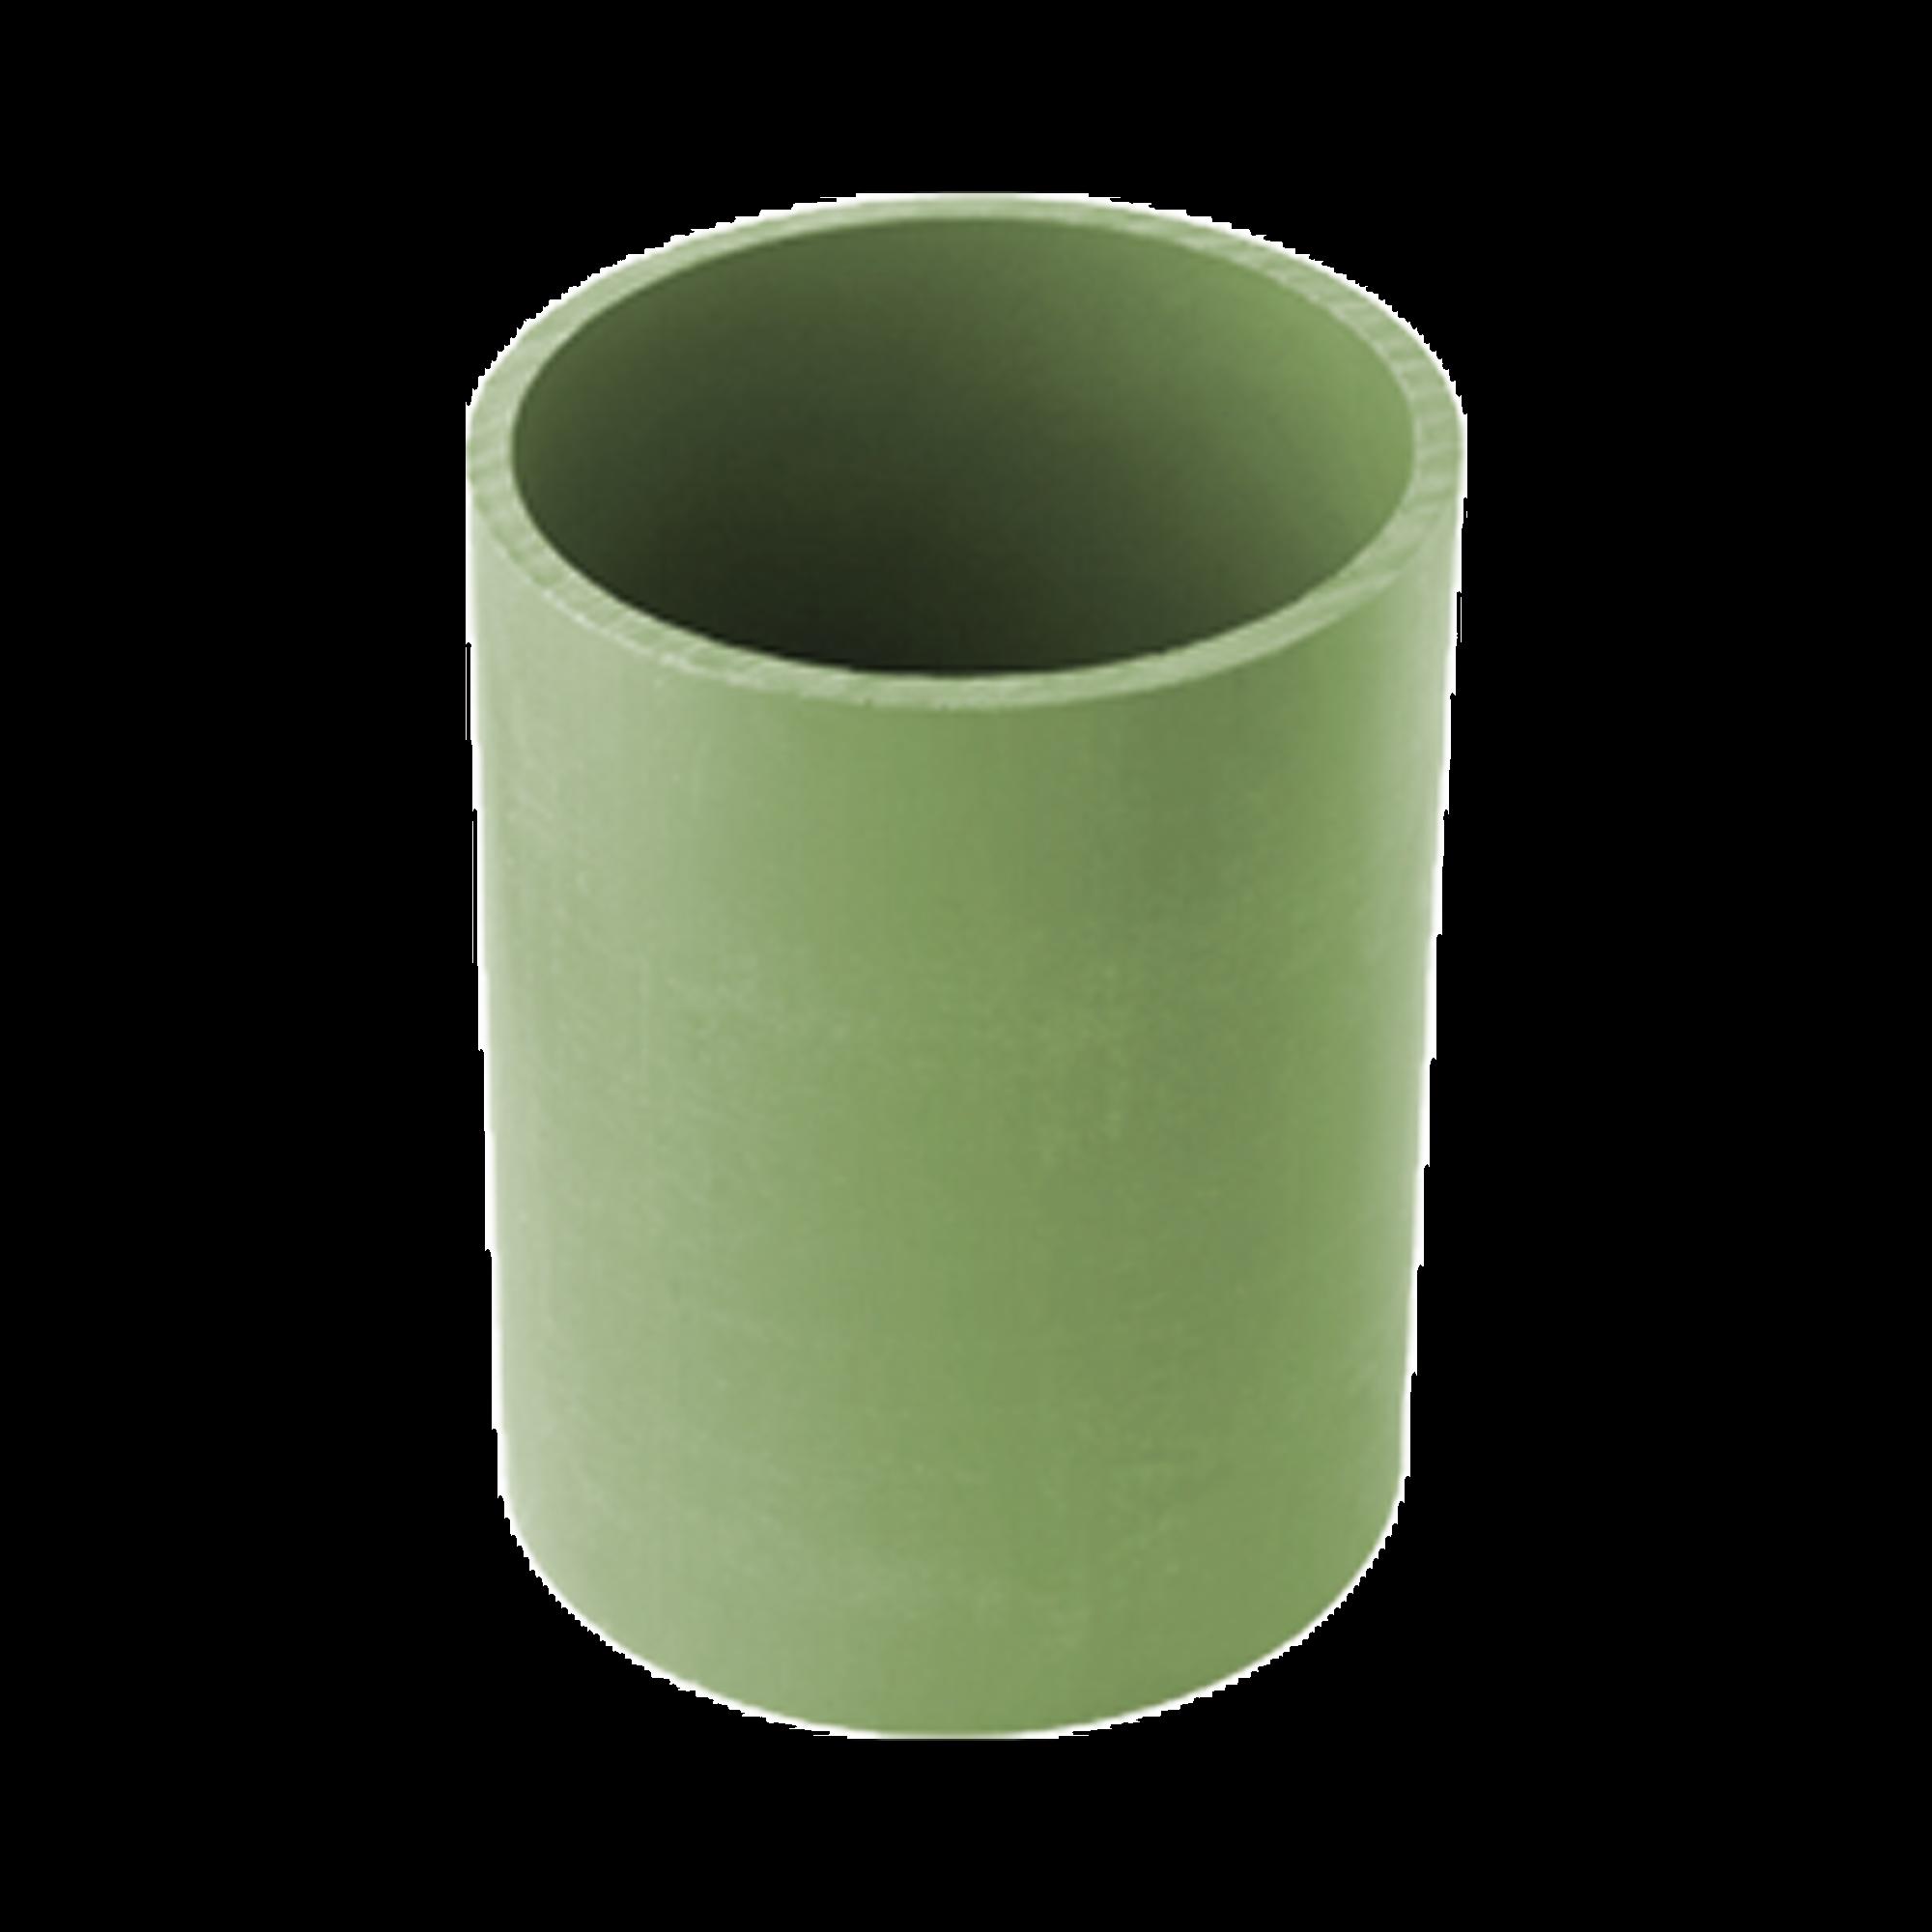 Cople para tubo PVC Conduit pesado de 1-1/2 (38 mm)